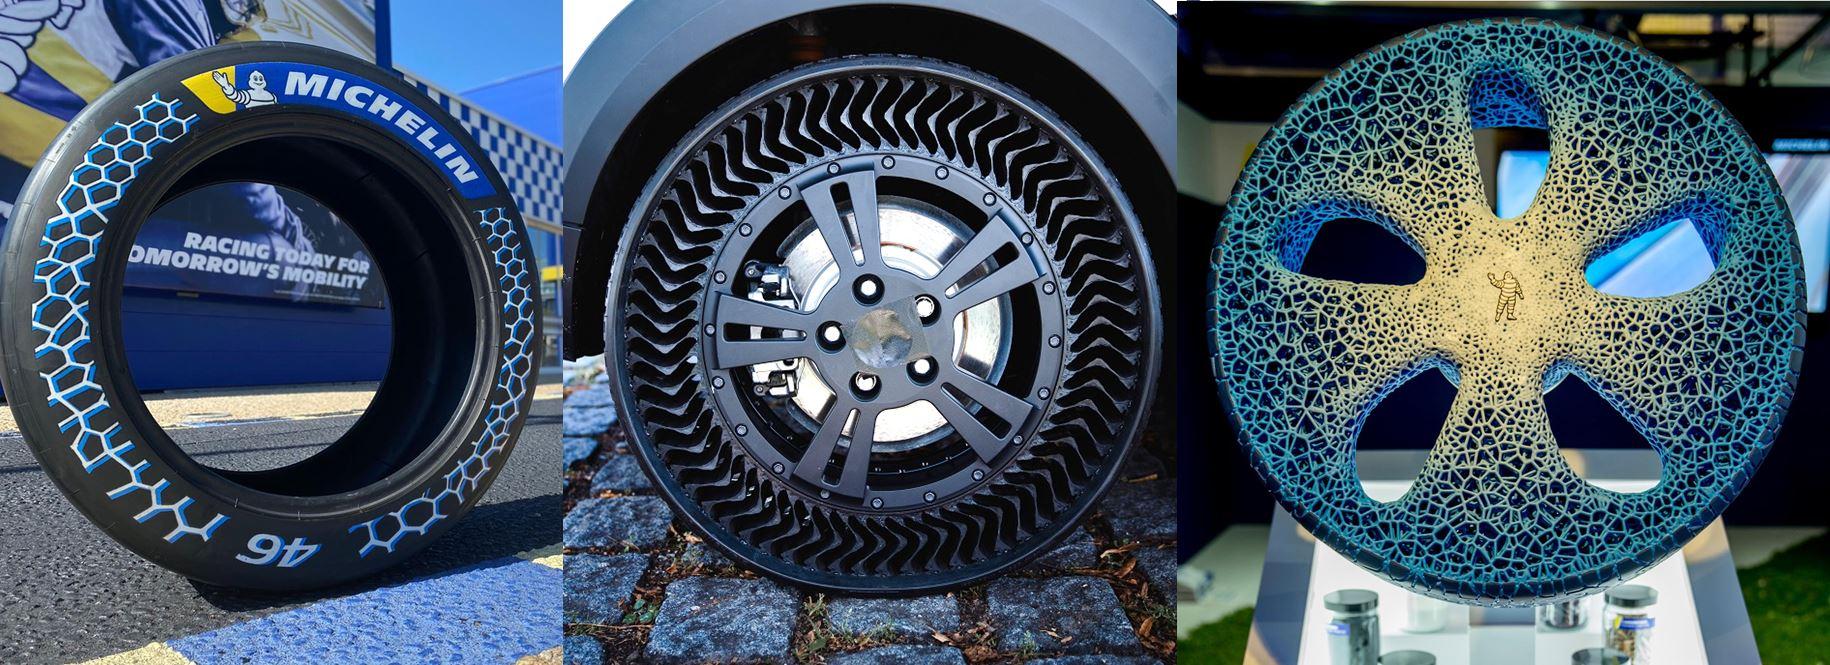 IAA Munich: Michelin's view of tomorrow's mobility